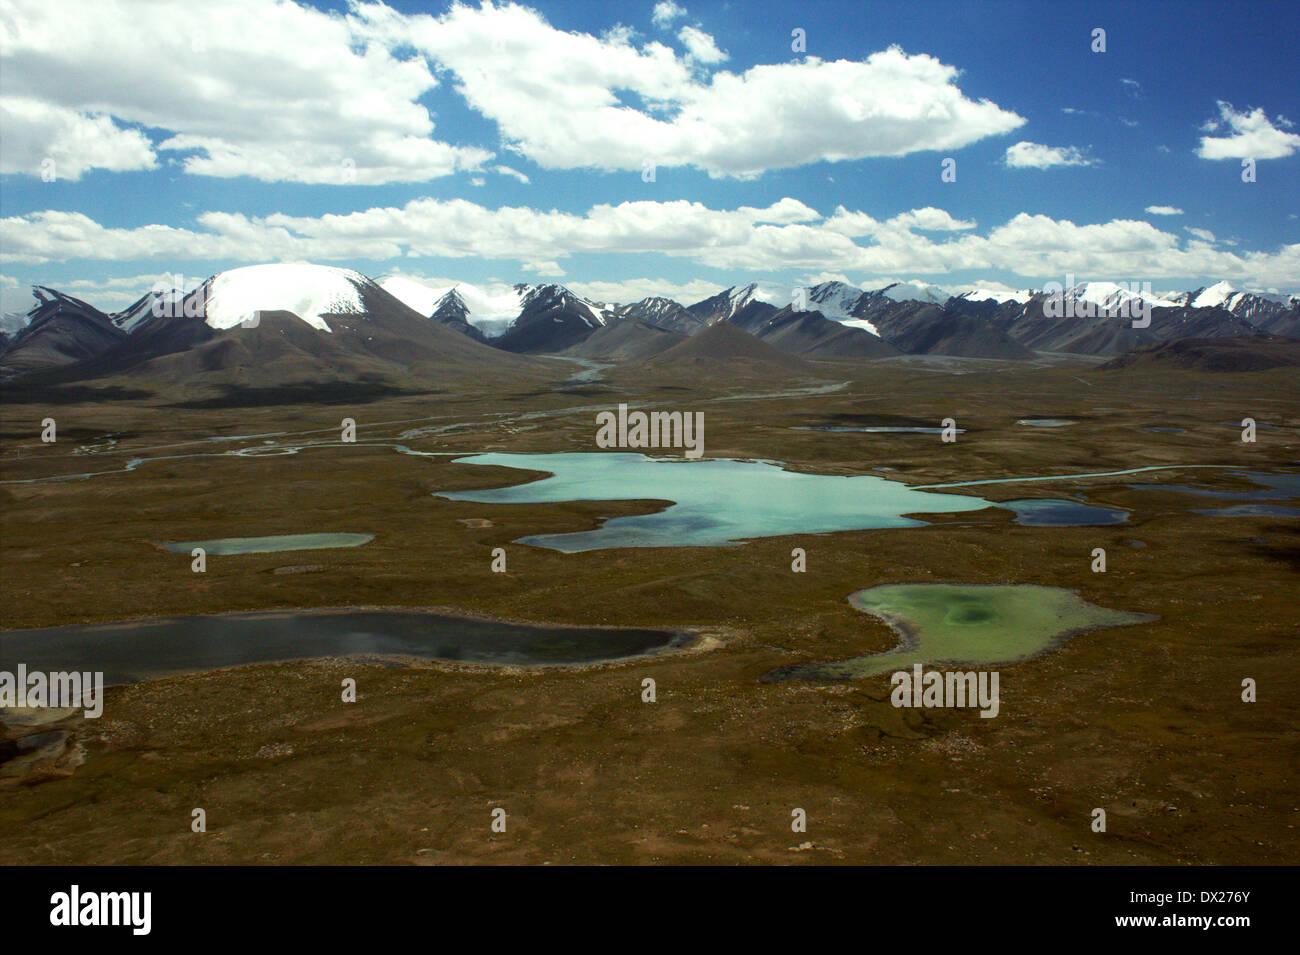 Glacial lakes at Barskaun (Barskoon) pass, Terskey ridge, Tien-Shan, Kyrgyzstan Stock Photo